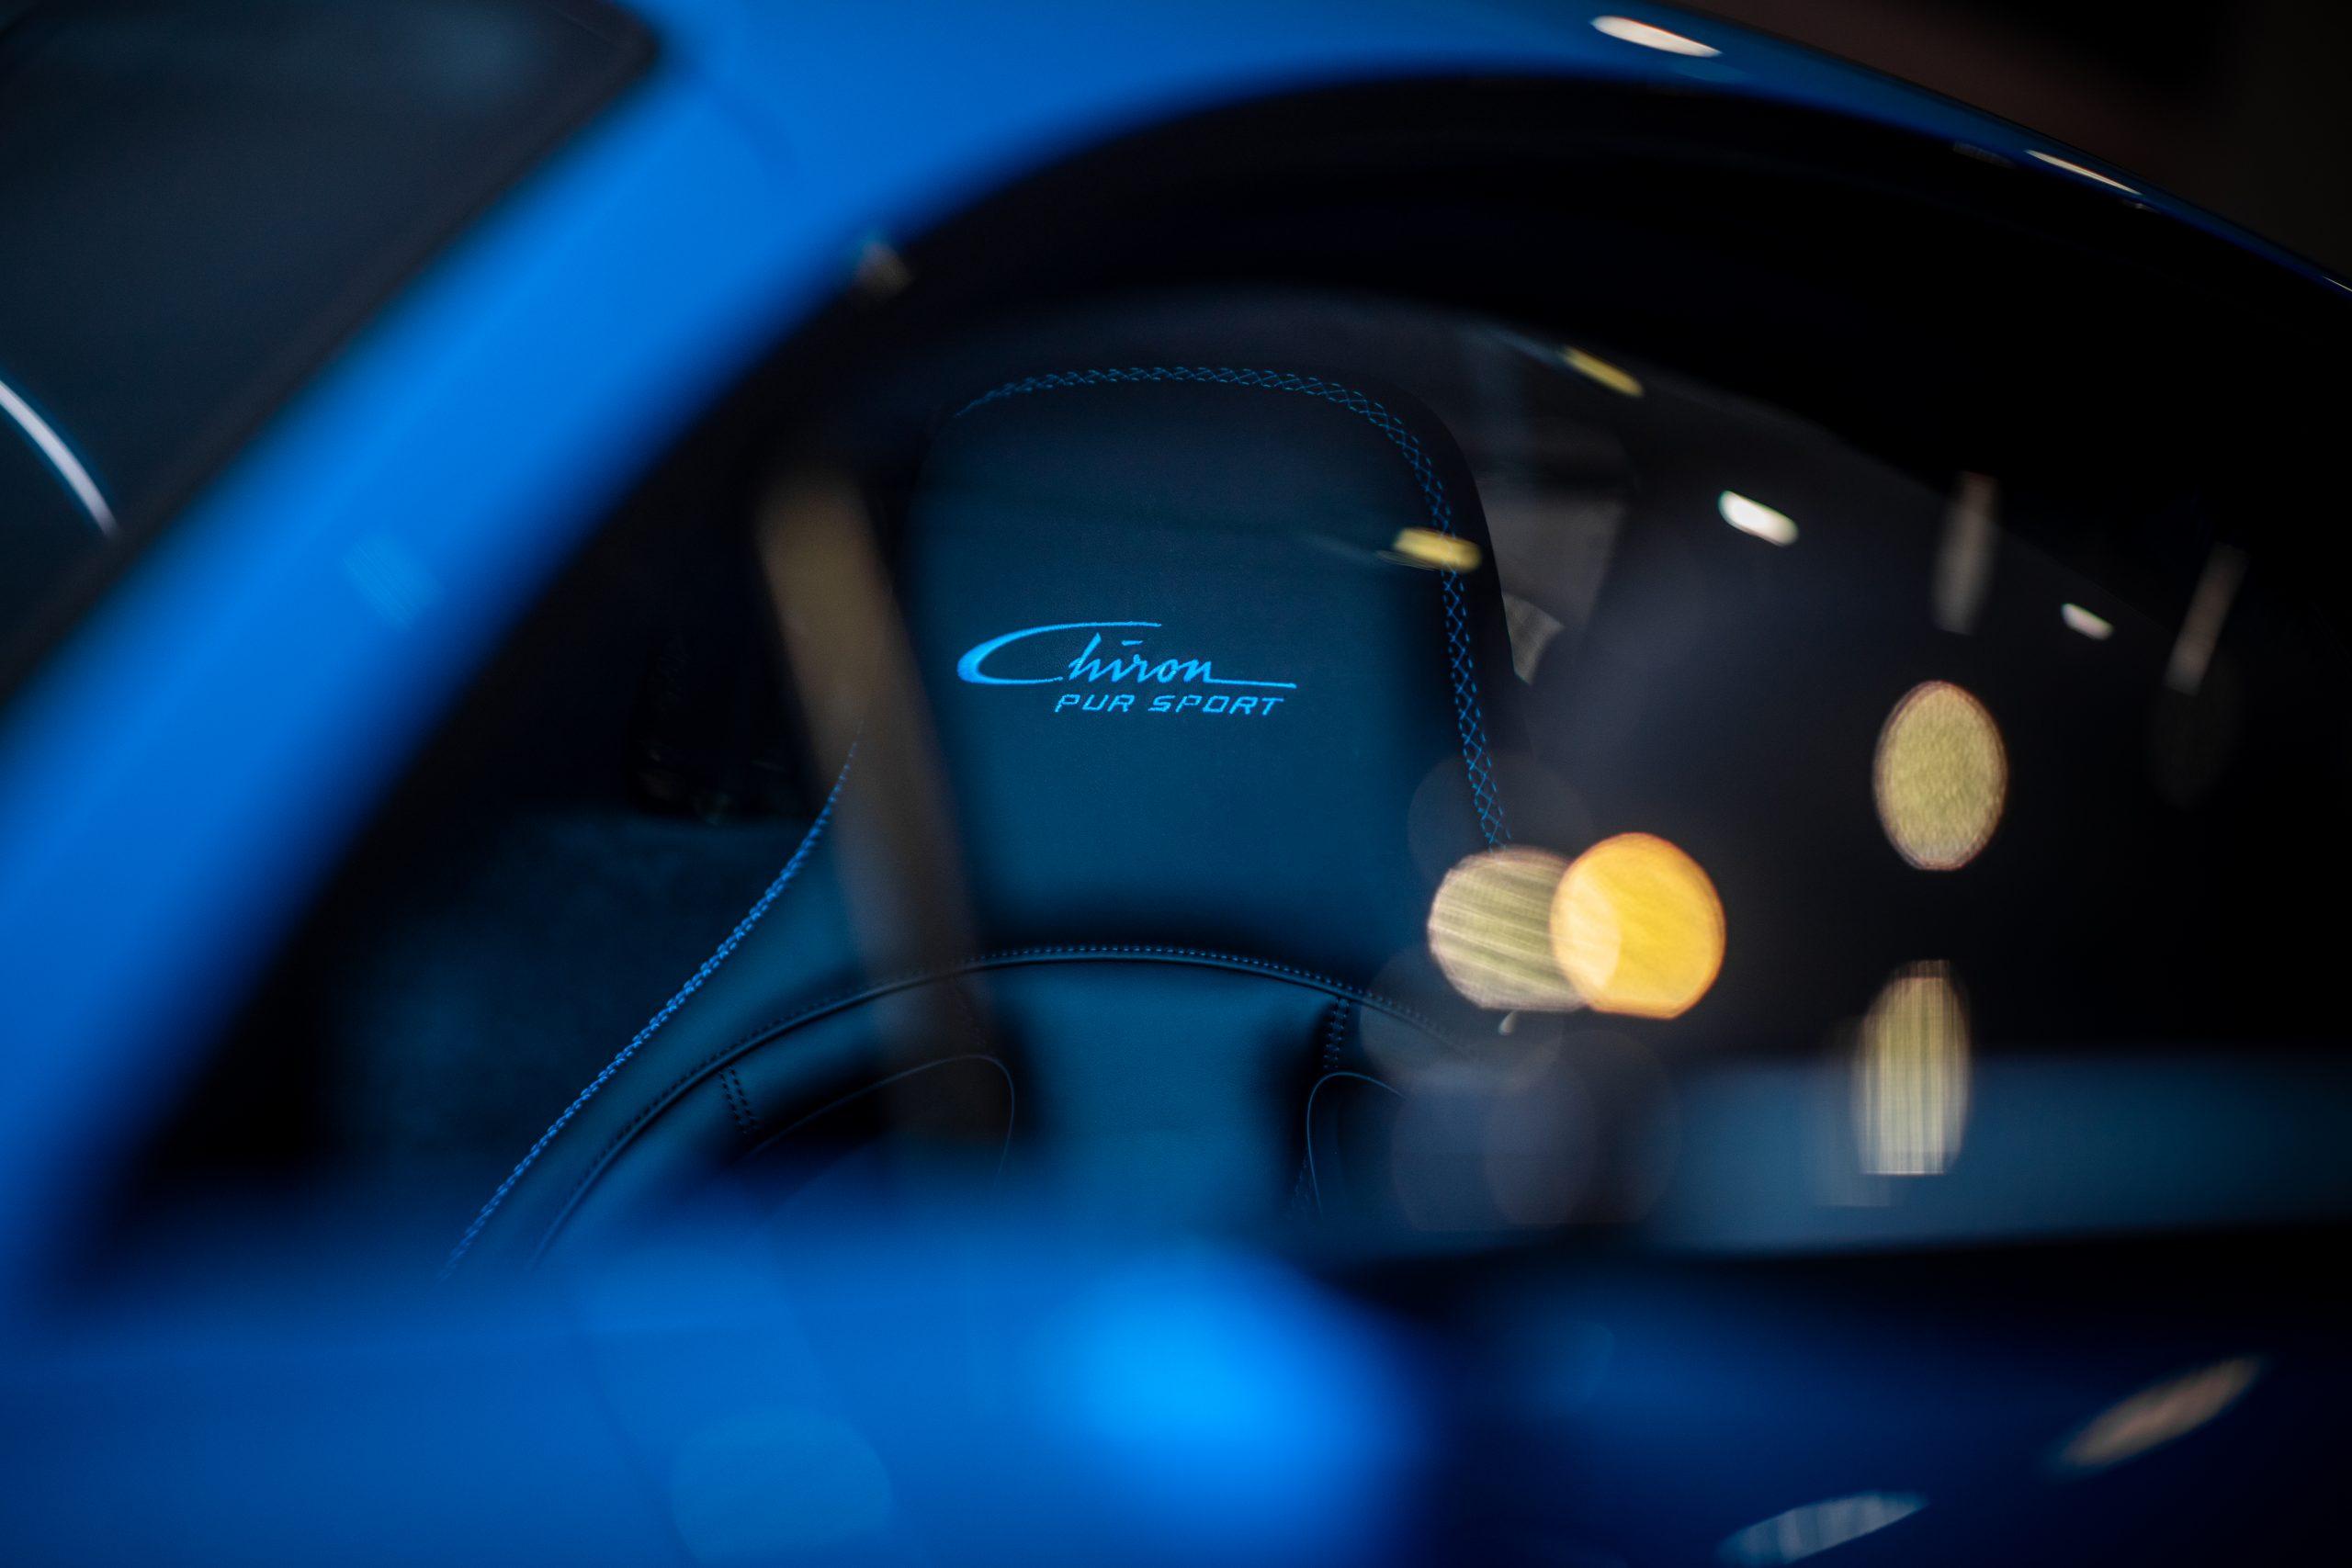 Bugatti-Chiron-Pur-Sport-show-car-6